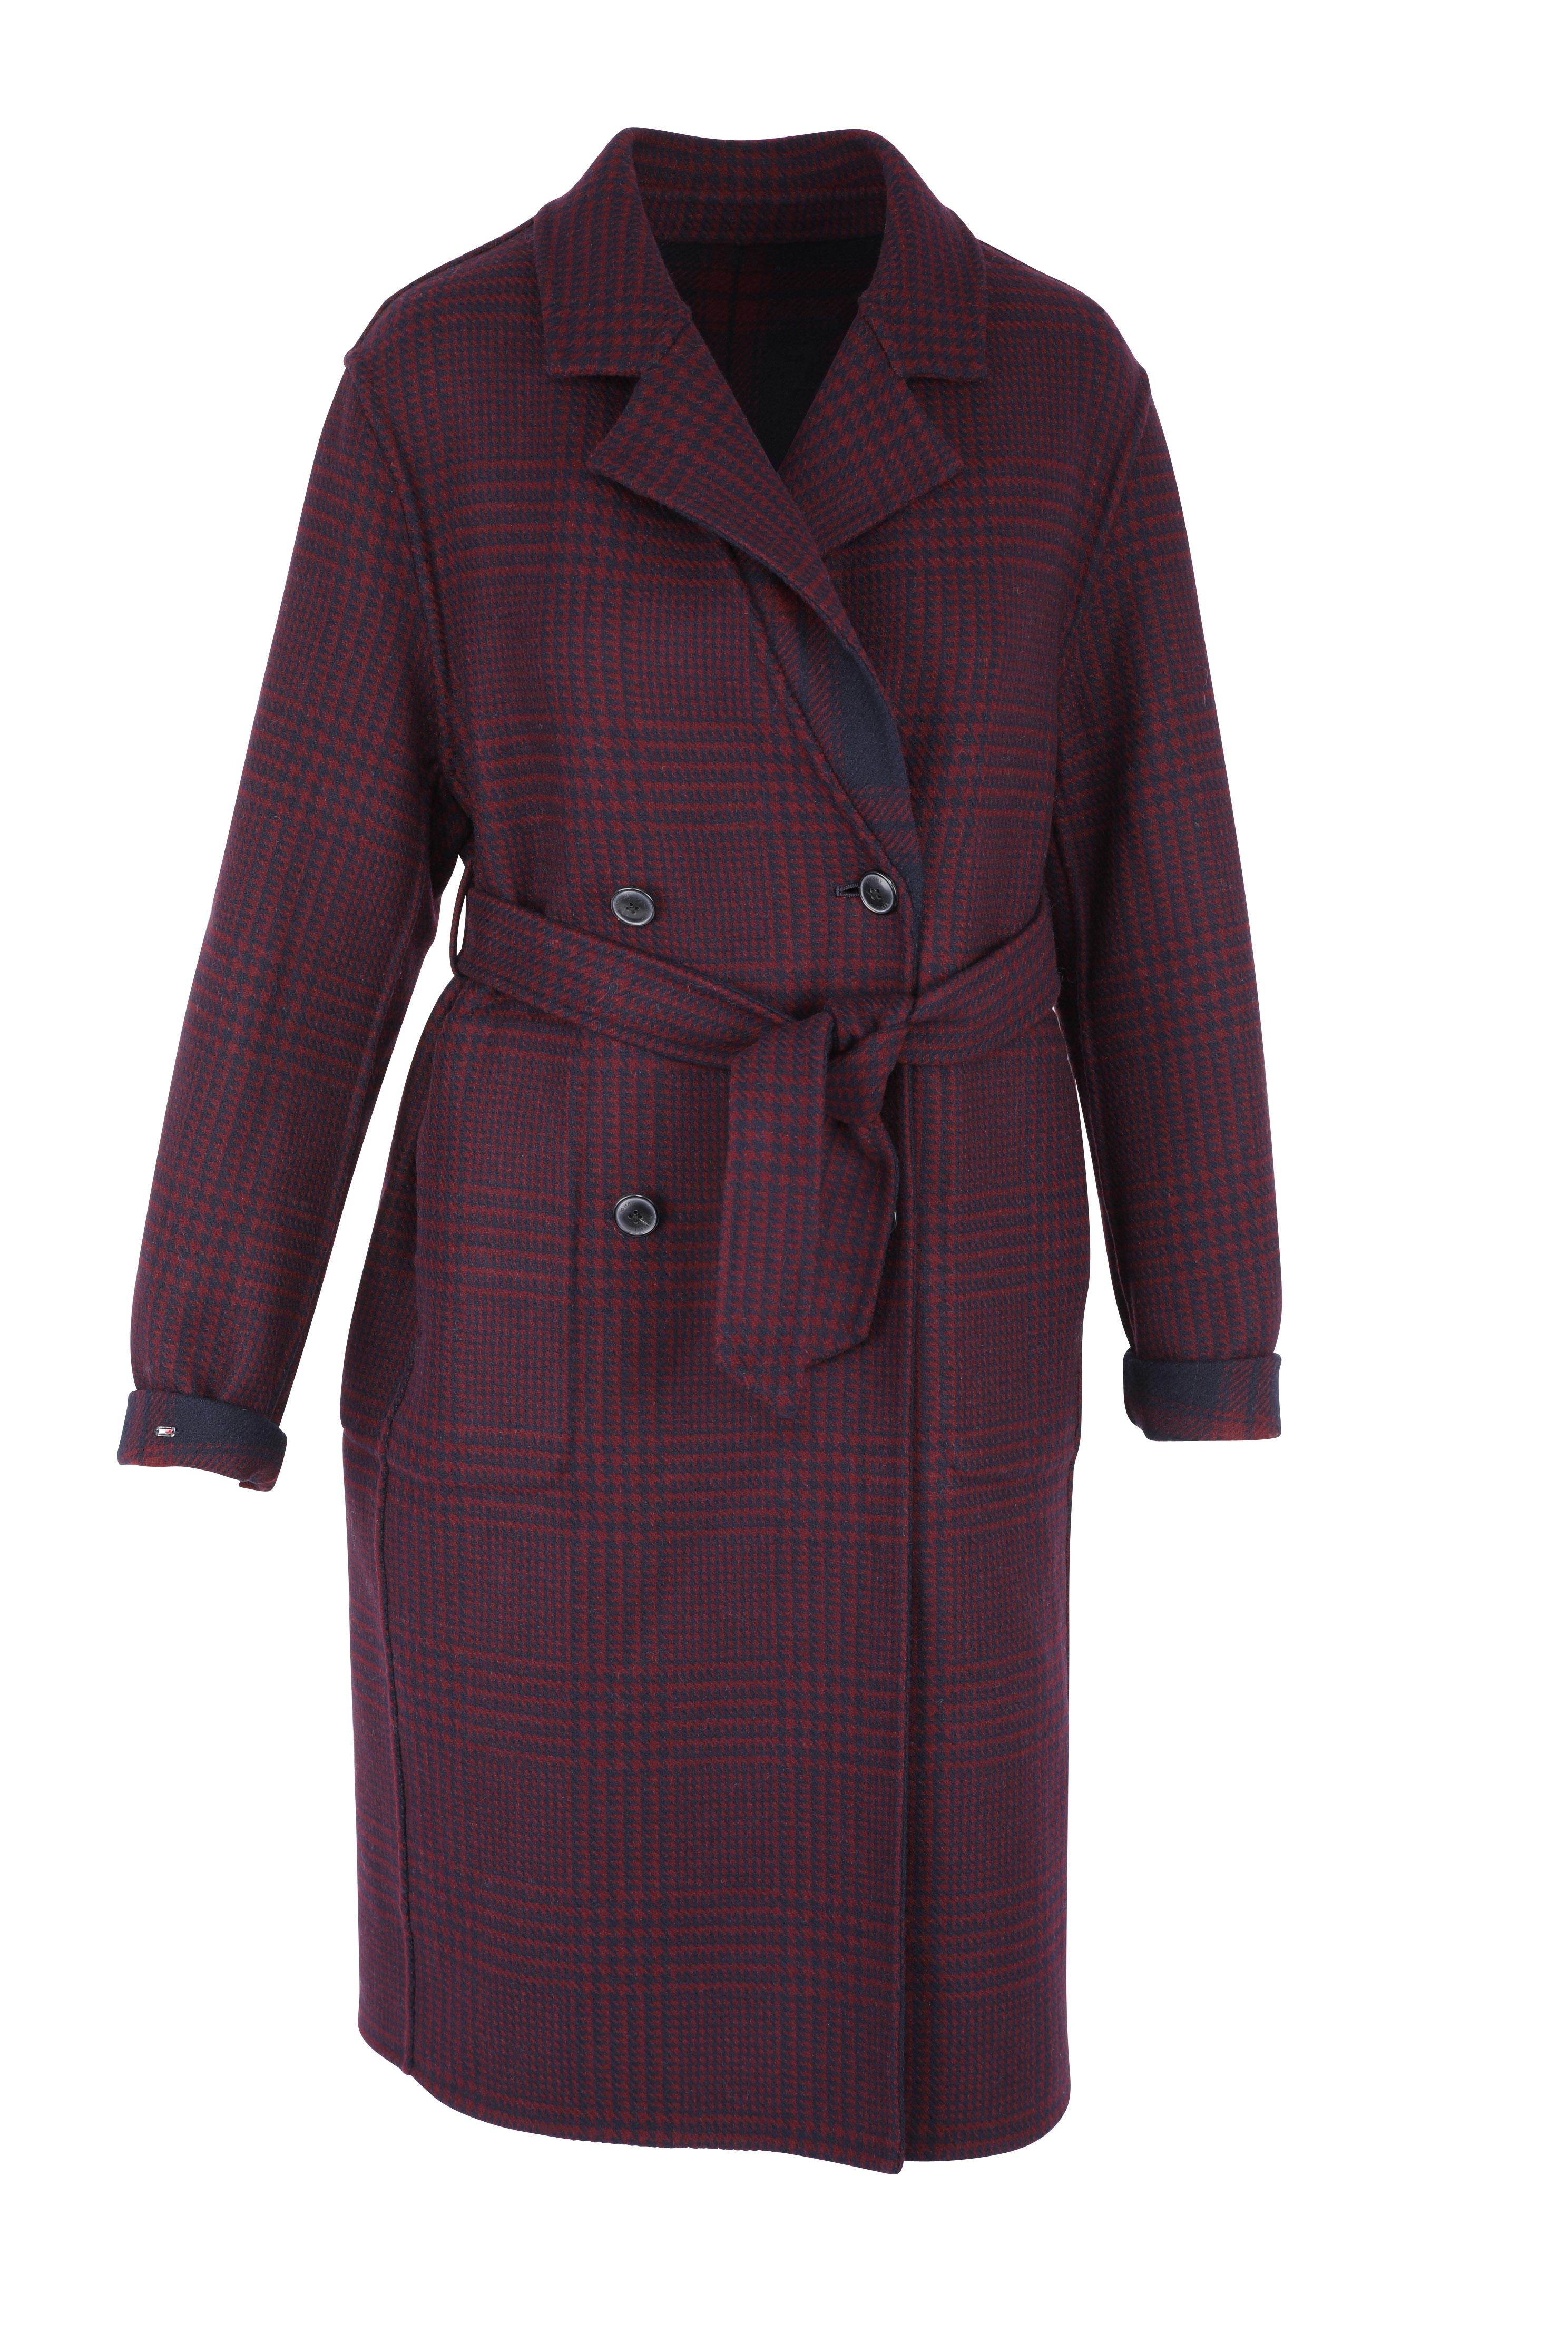 heavy weigth wool blend coat